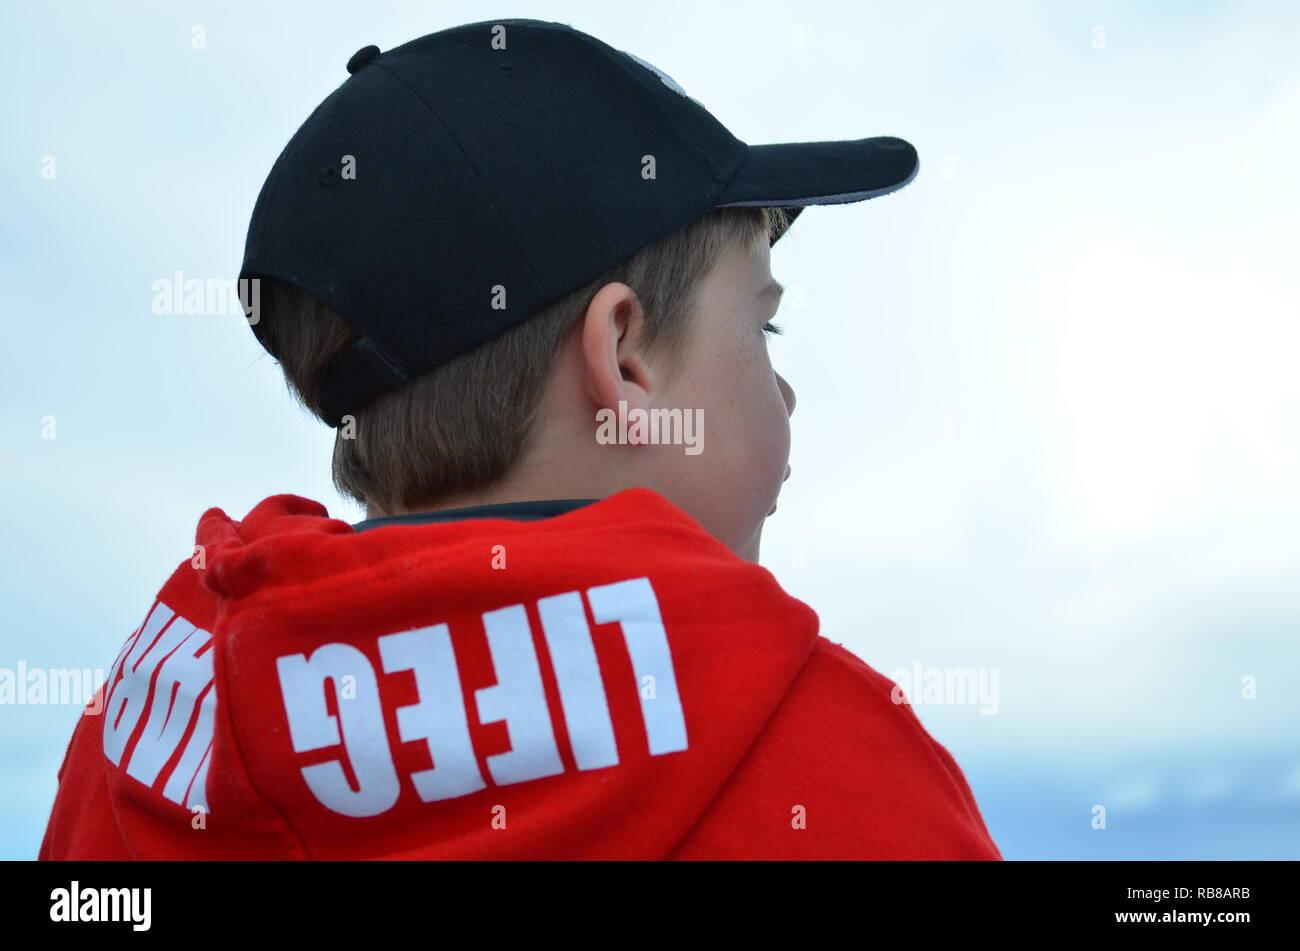 Boy on boat - Stock Image